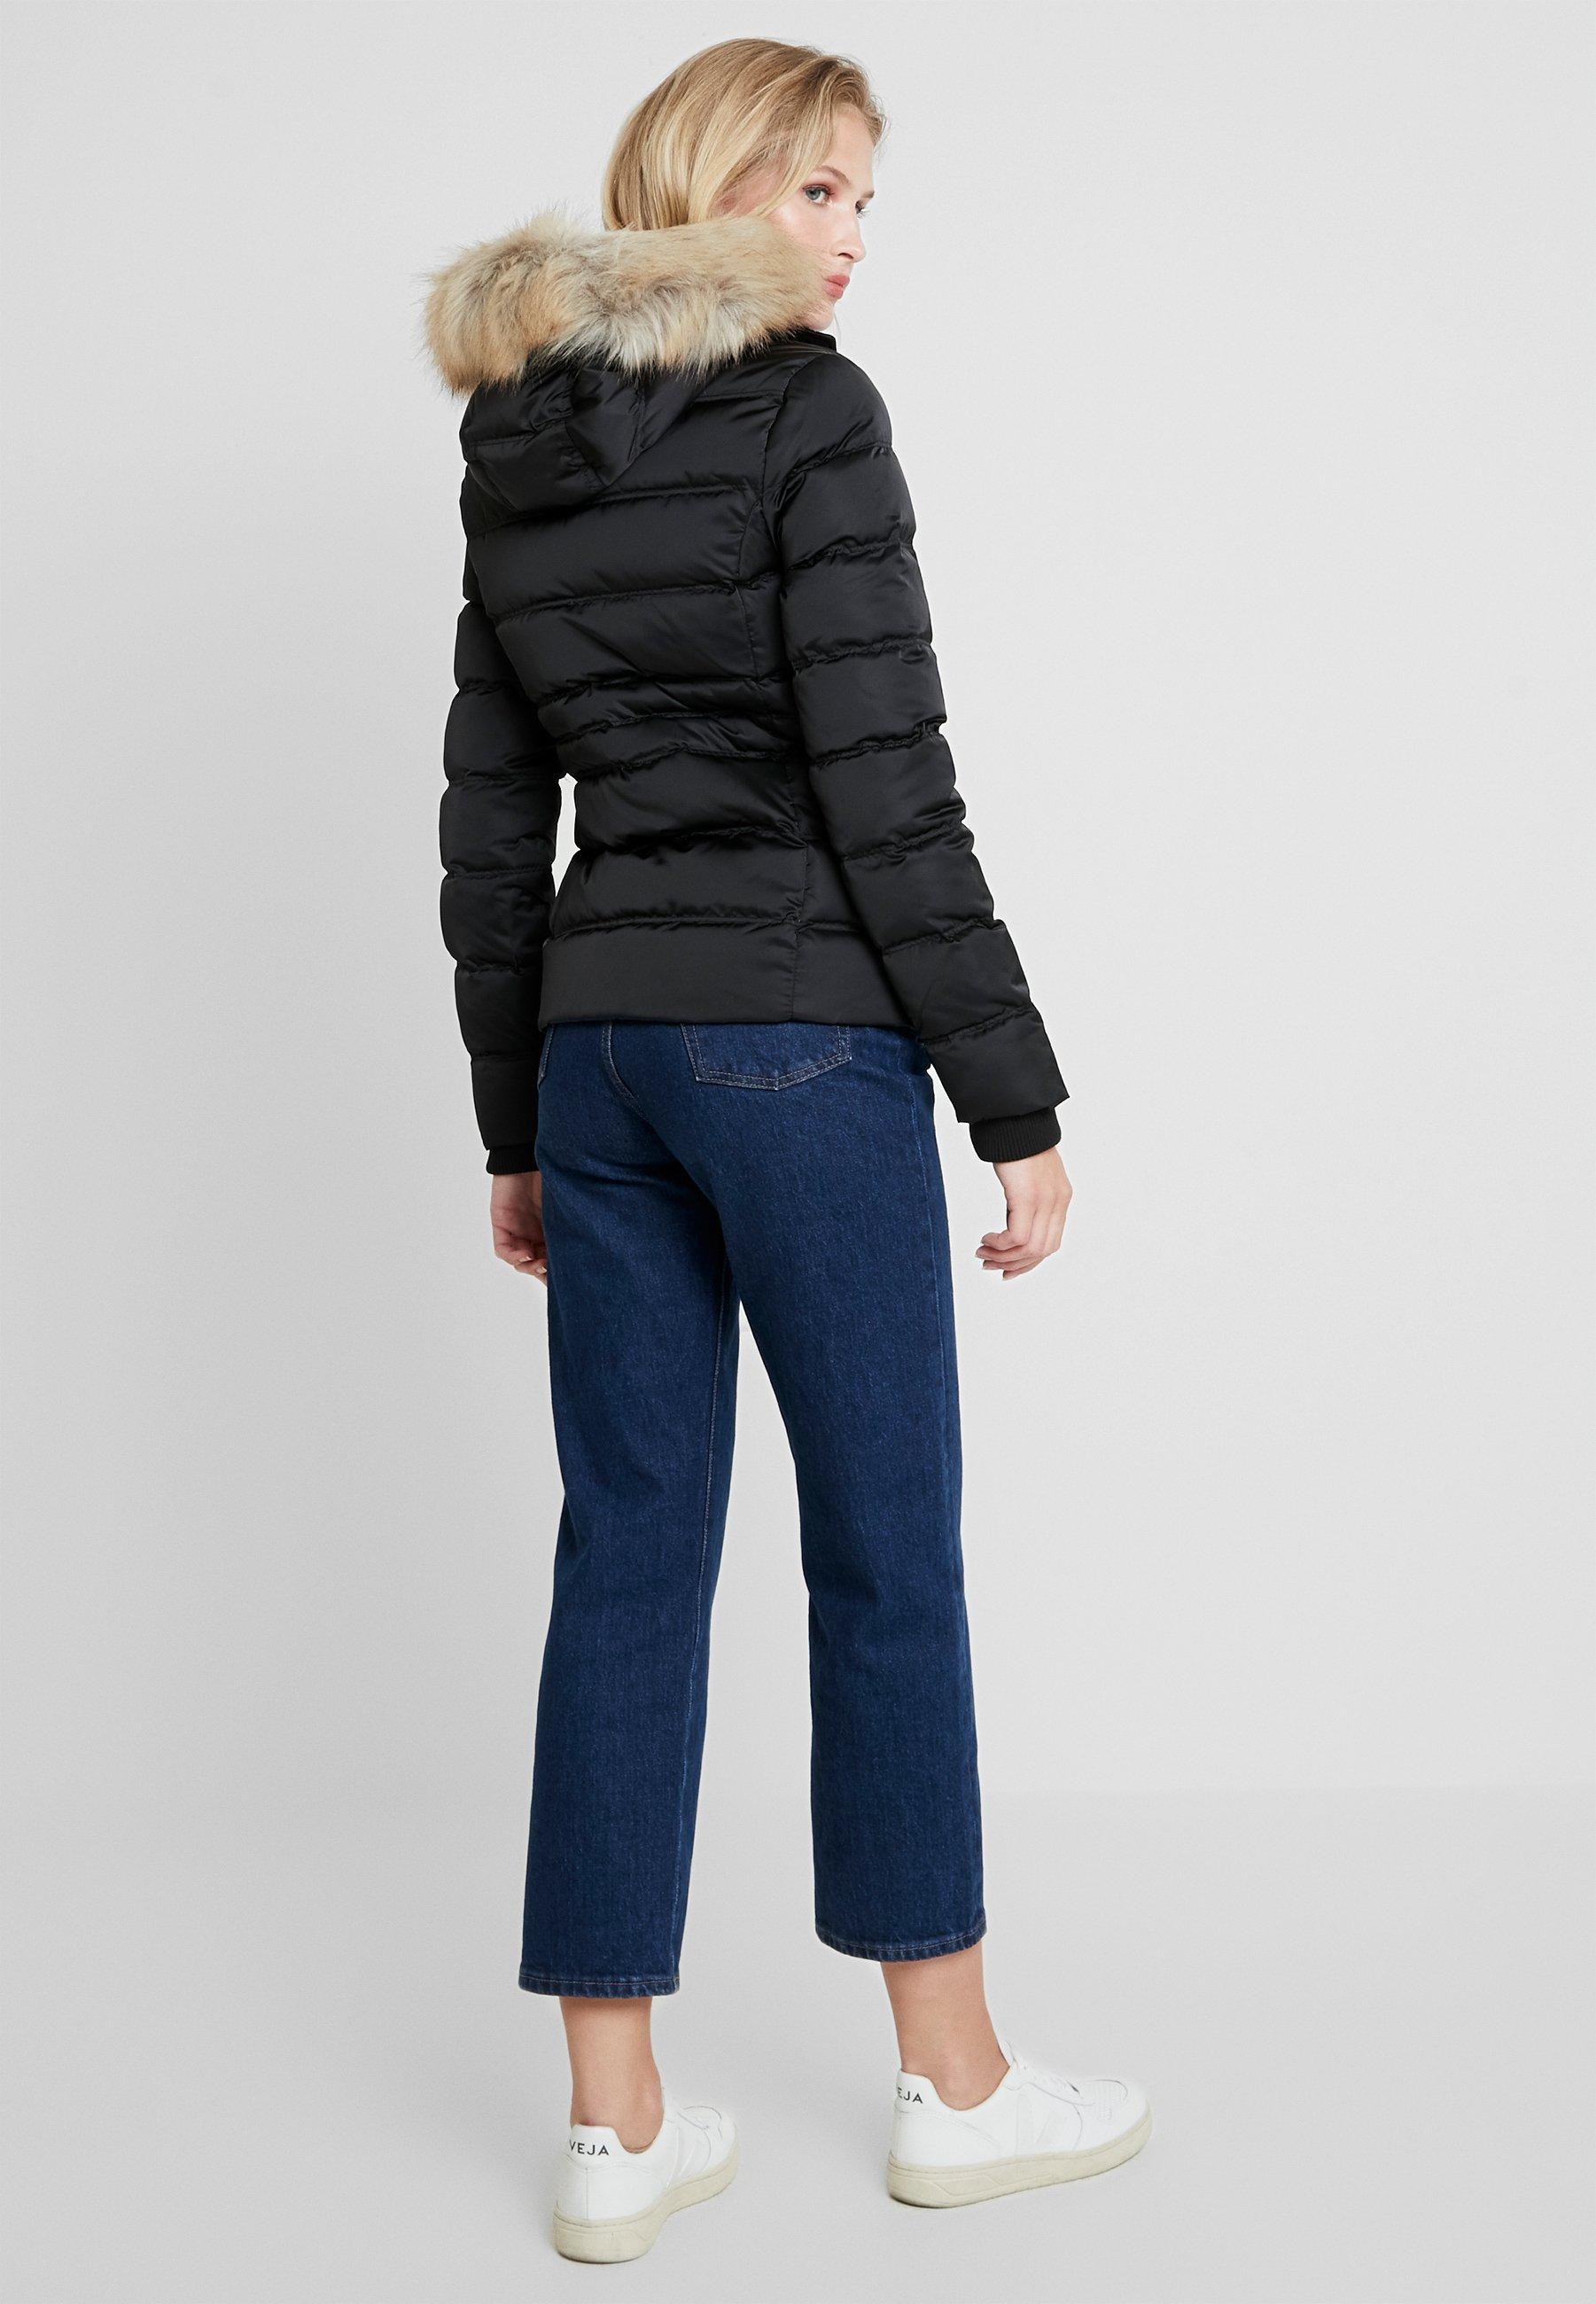 Calvin Fitted Klein PufferDoudoune Jeans Black 2IEYeWH9D